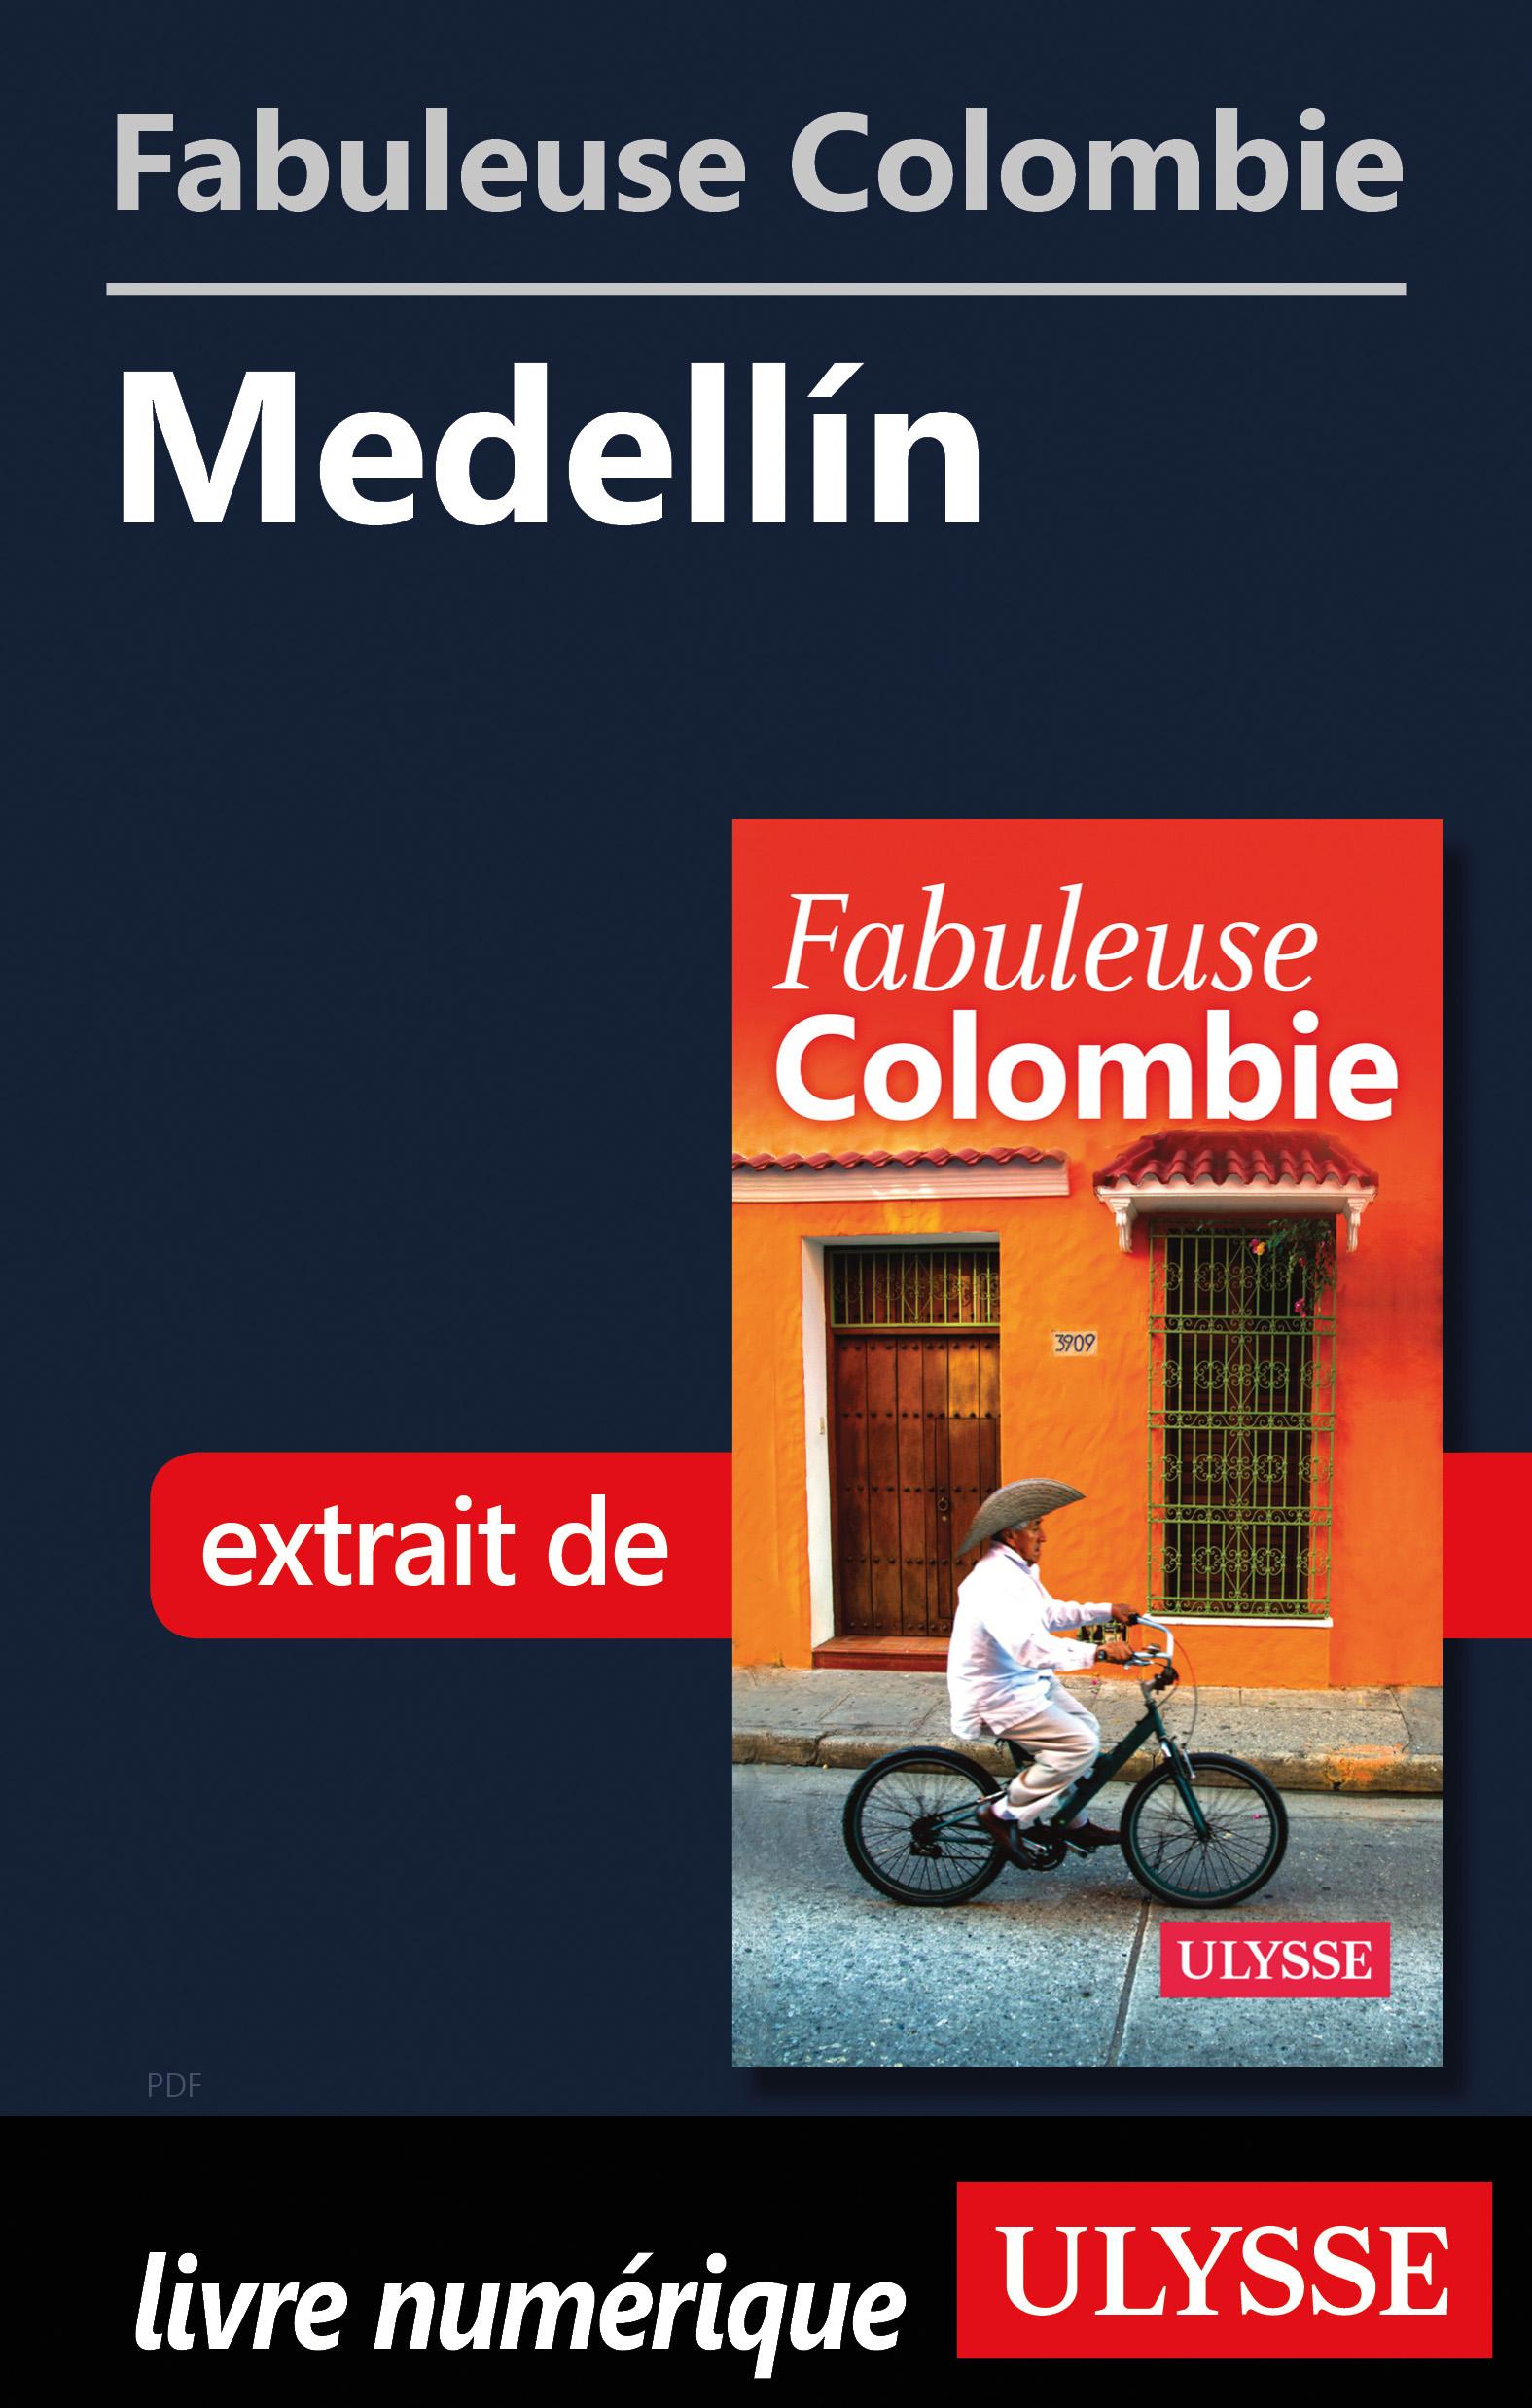 Fabuleuse Colombie: Medellín